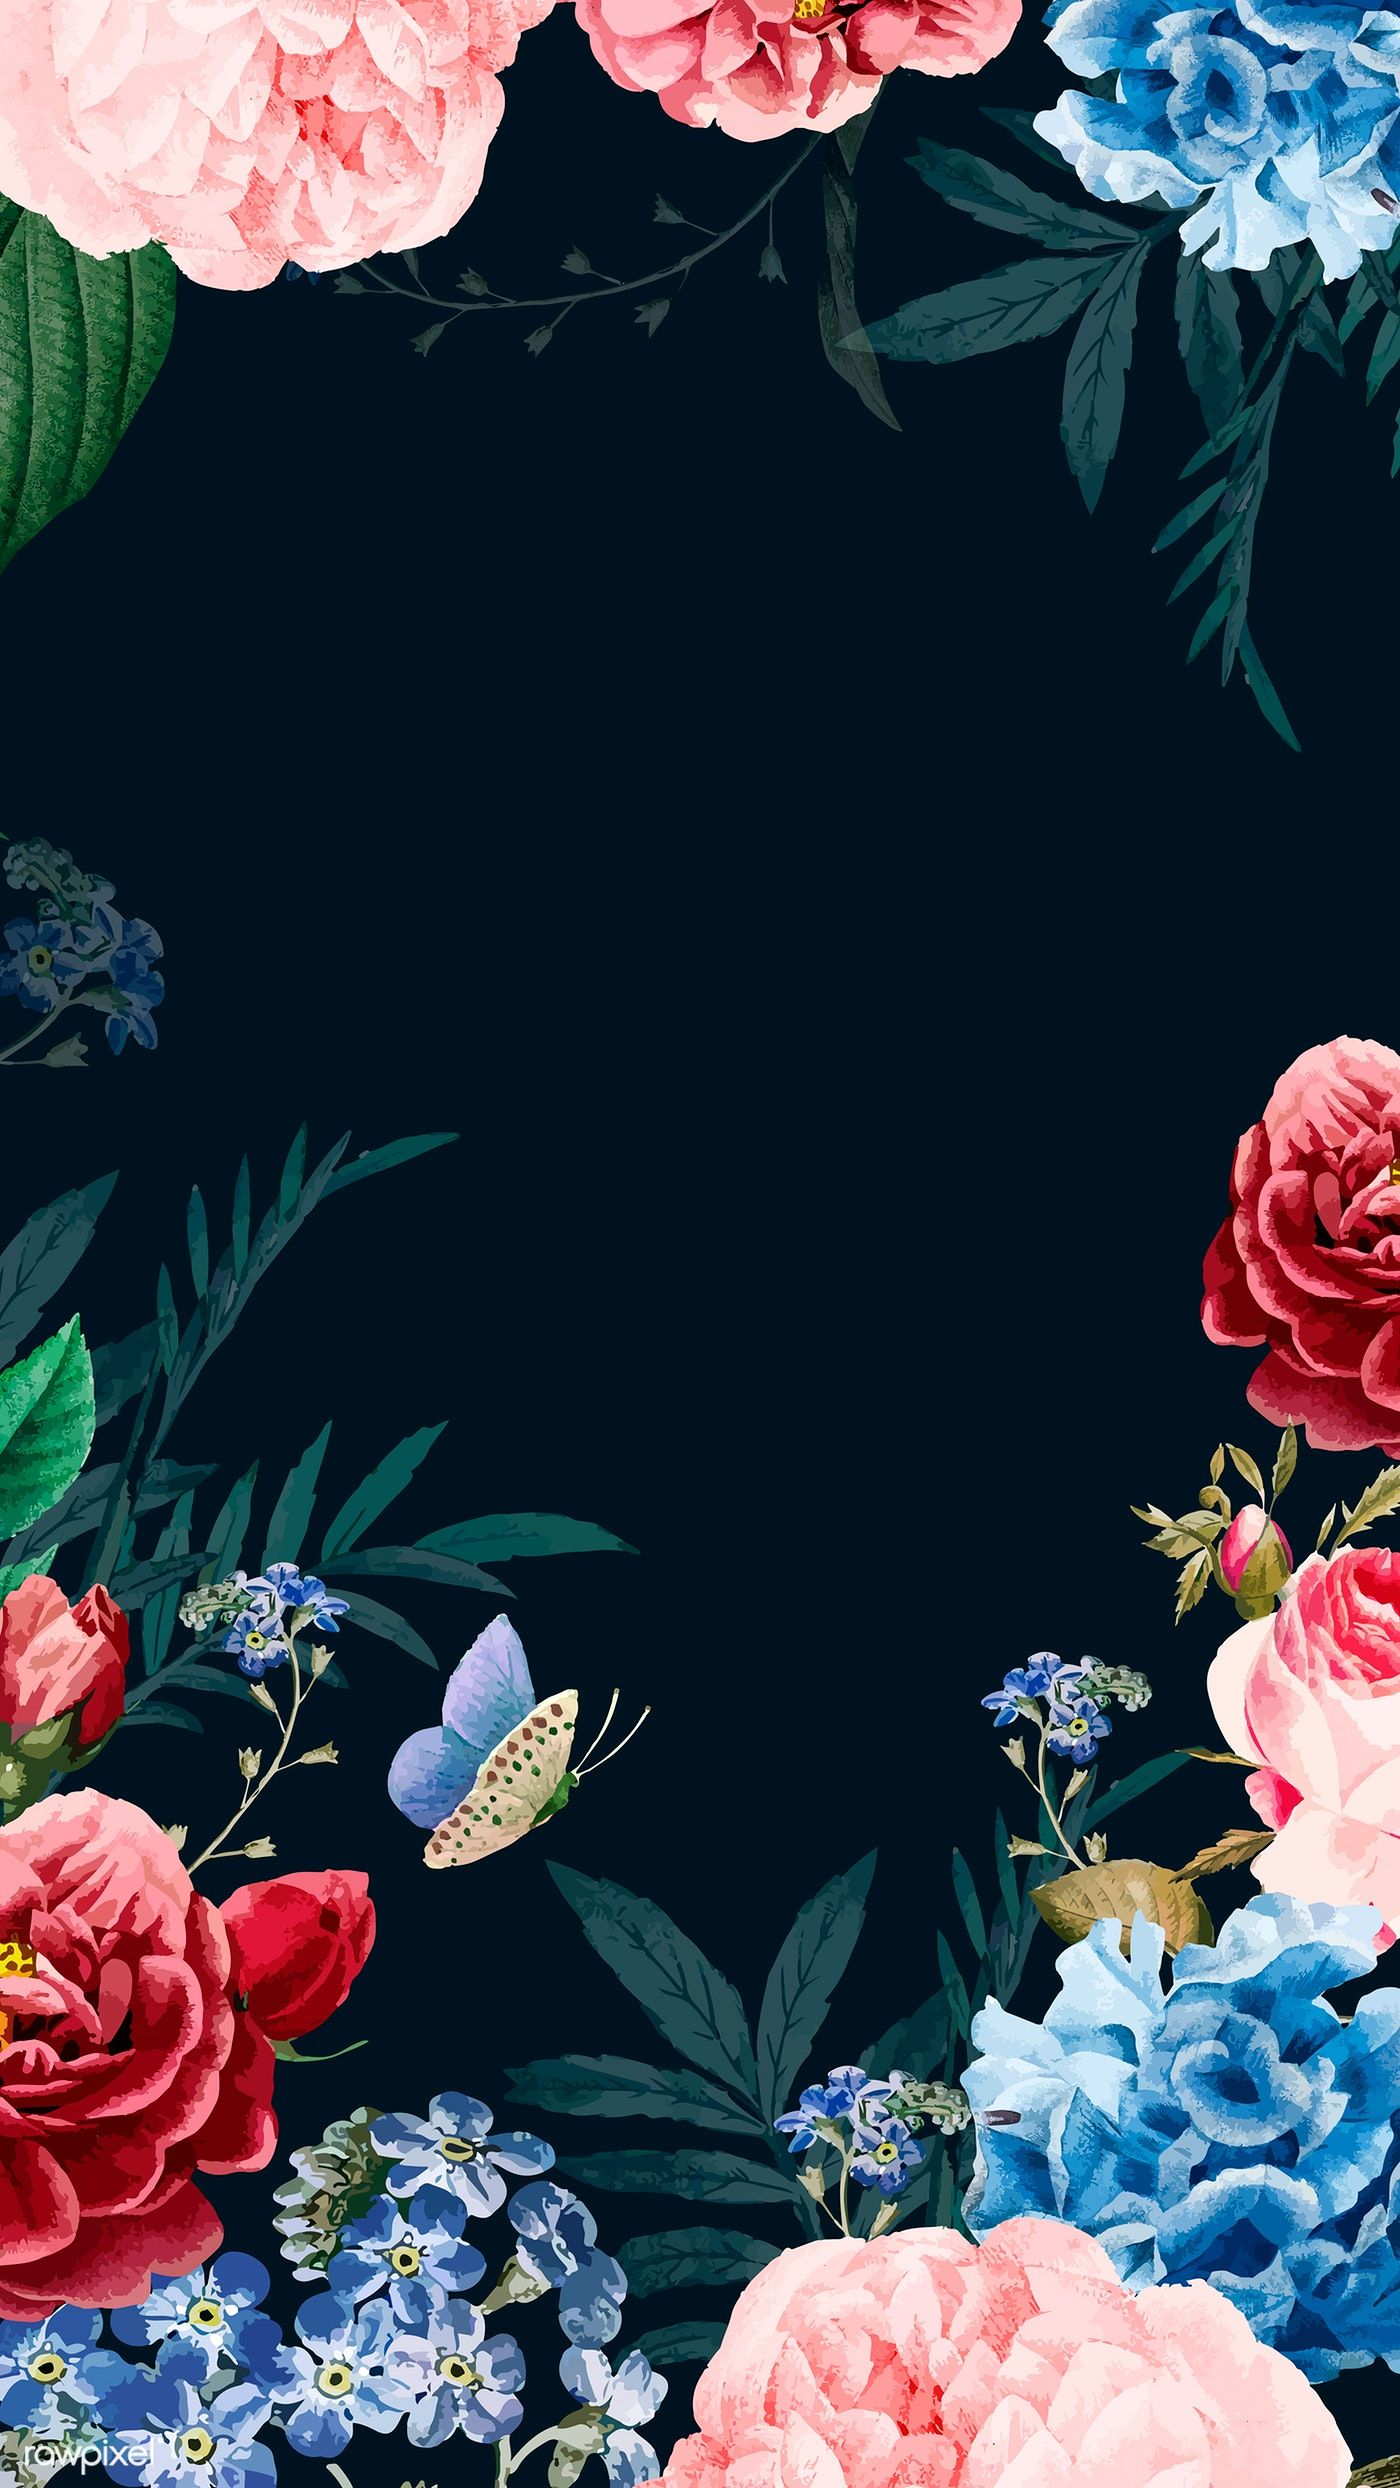 Download Premium Illustration Of Blooming Elegant Floral